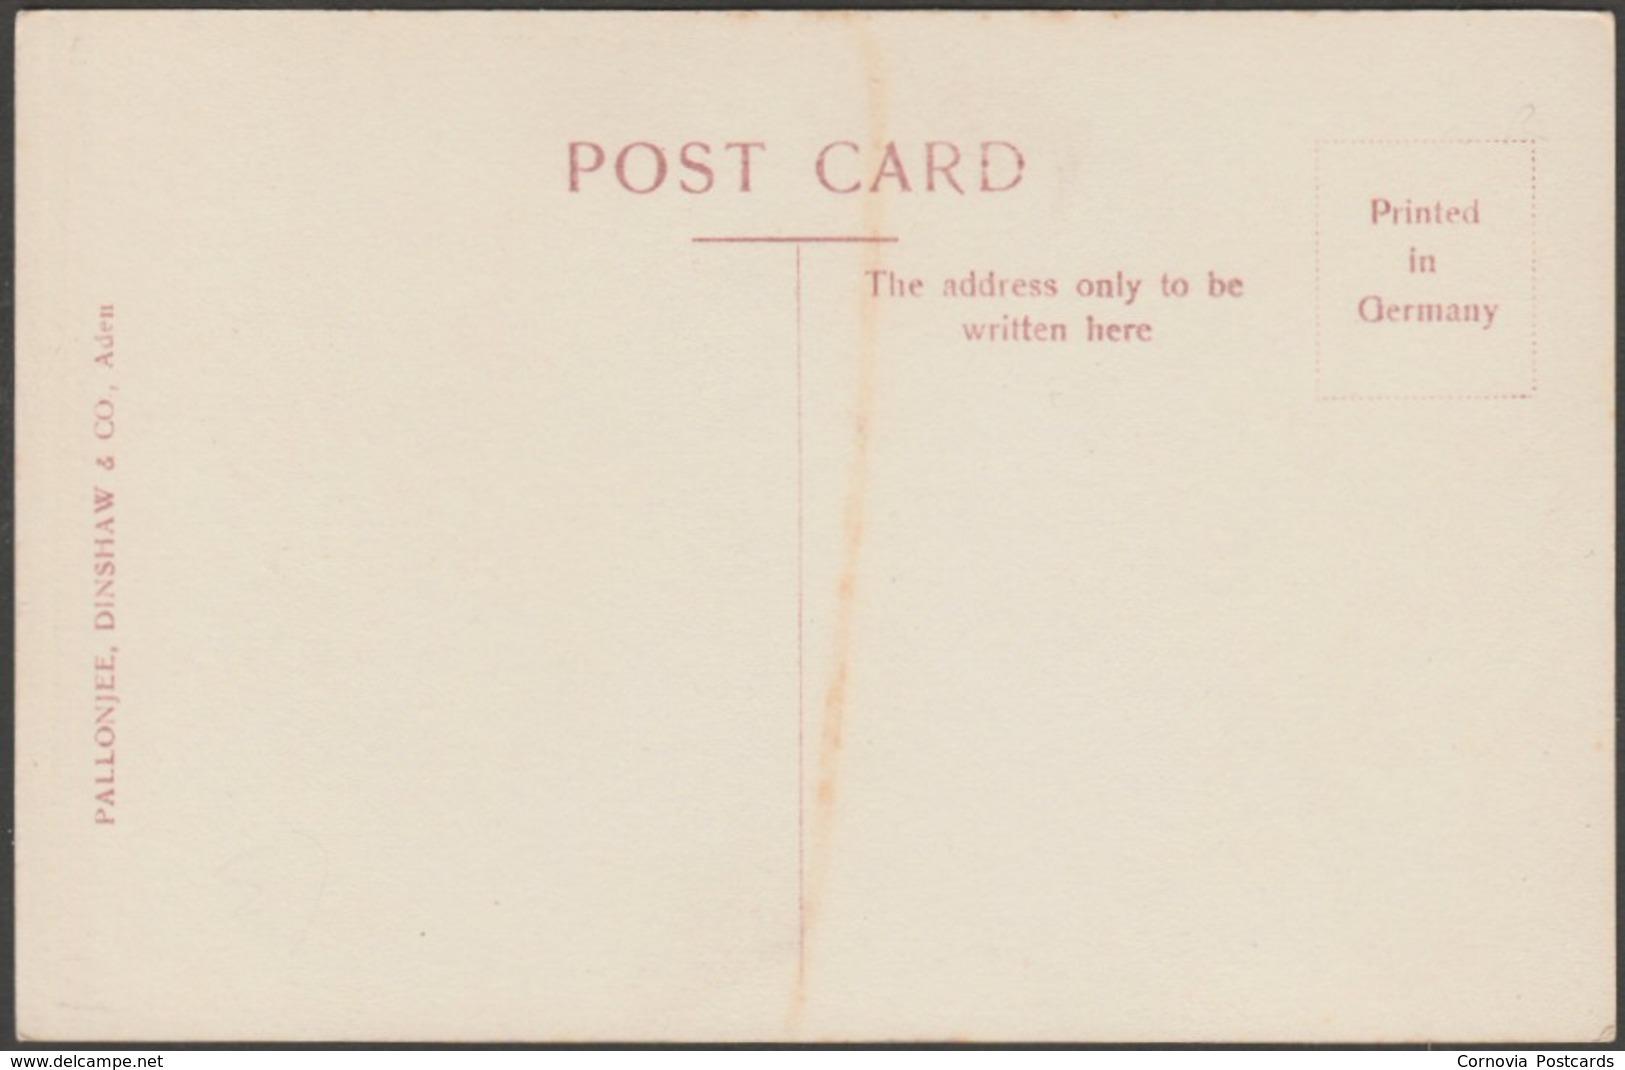 Britannia Anonymous Society Cigarette Factory, Aden, 1911 - Pallonjee, Dinshaw & Co RP Postcard - Yemen